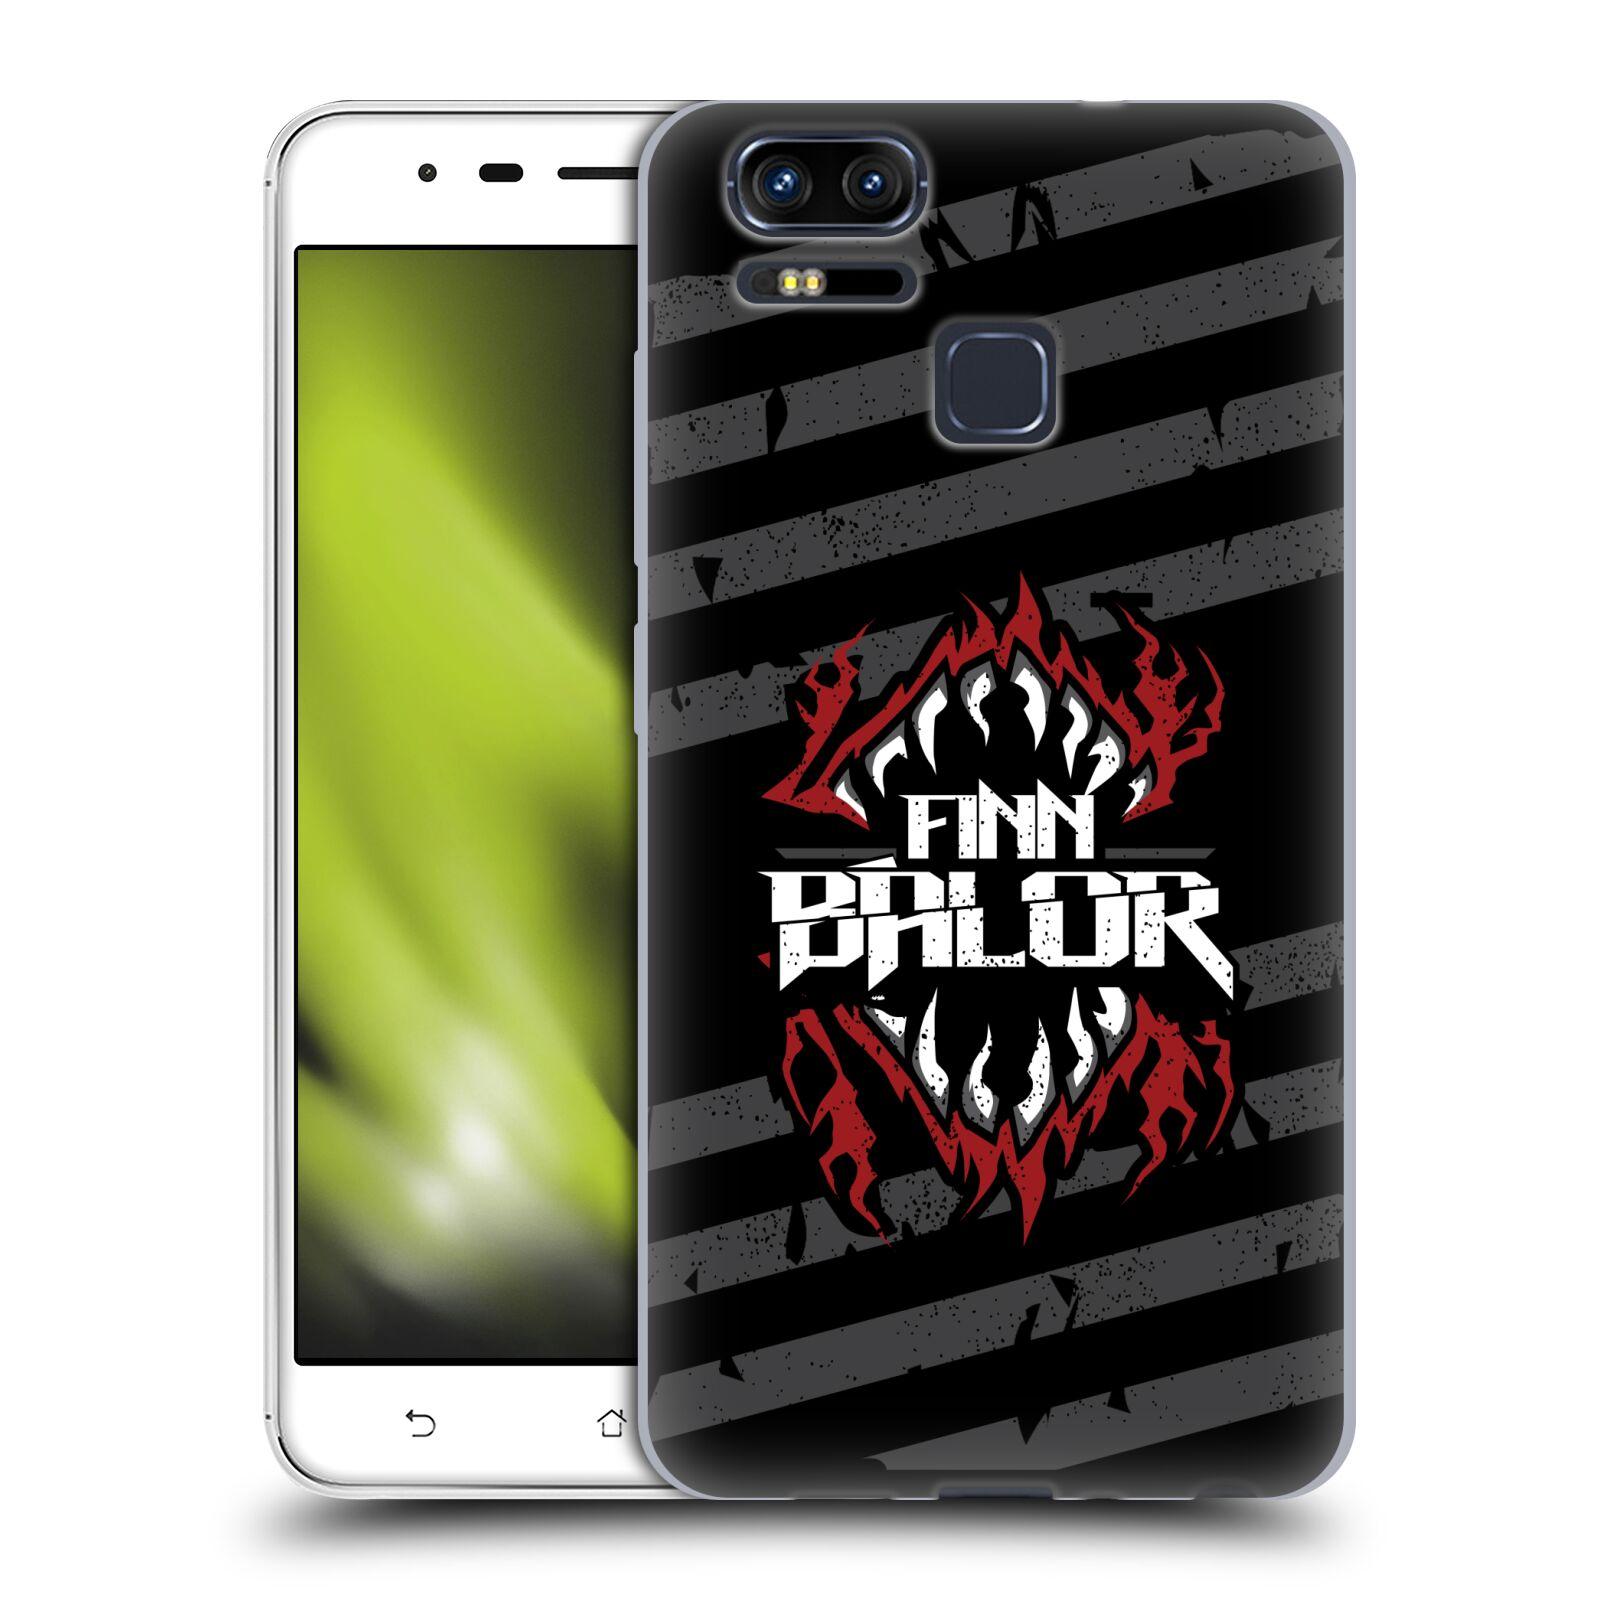 OFFICIAL-WWE-2017-FINN-BALOR-SOFT-GEL-CASE-FOR-ASUS-ZENFONE-PHONES